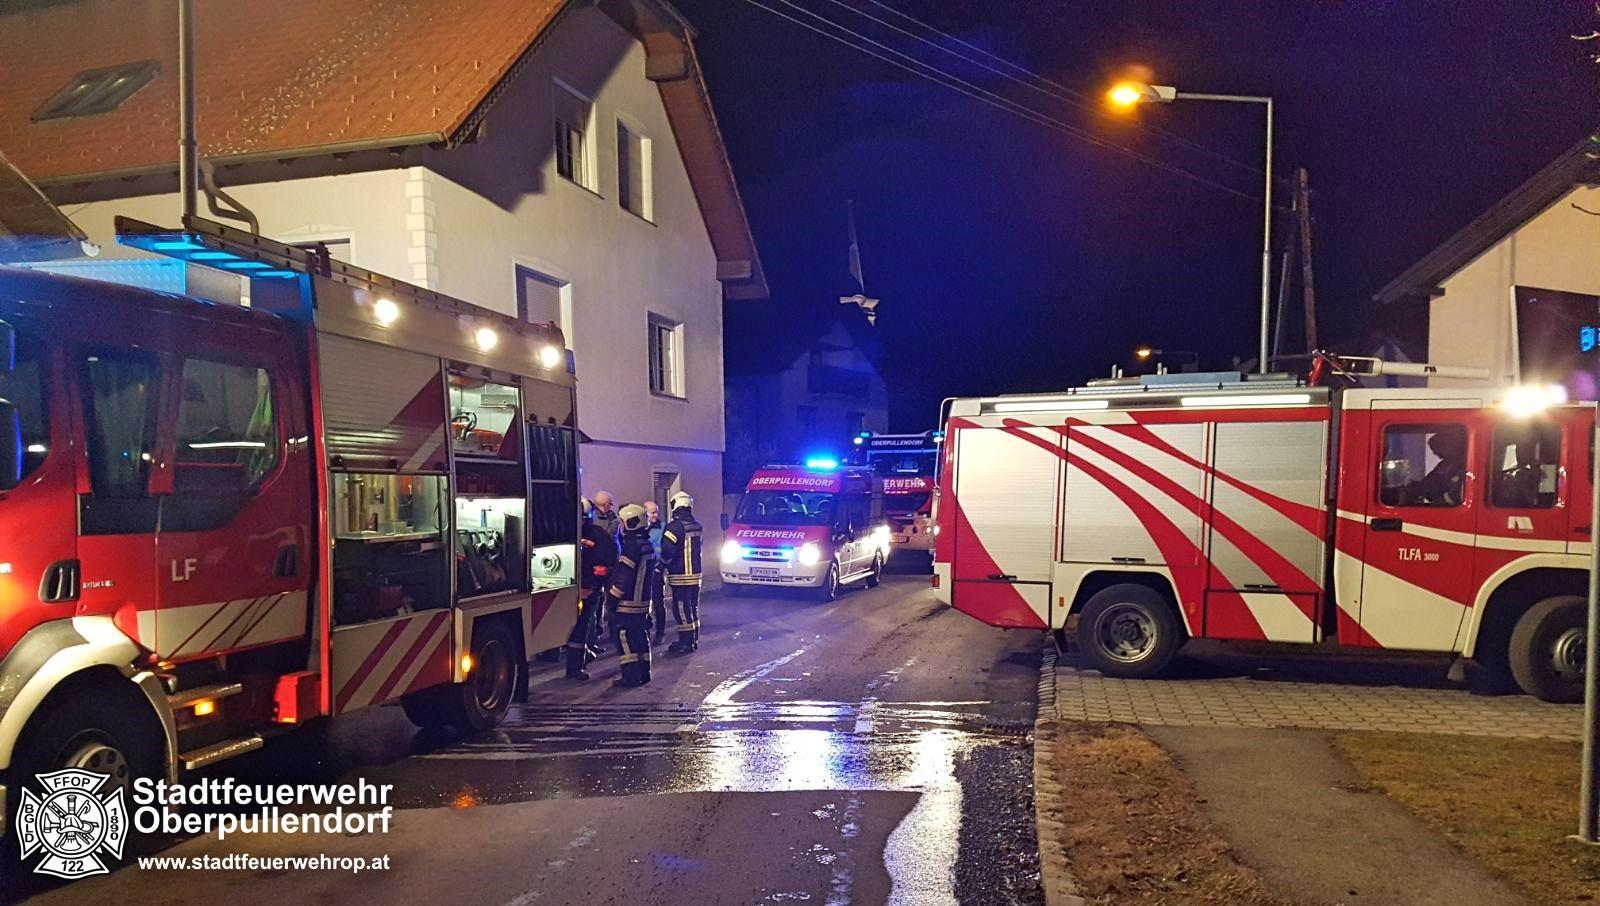 Stadtfeuerwehr Oberpullendorf: Kellerbrand in Bubendorf 1